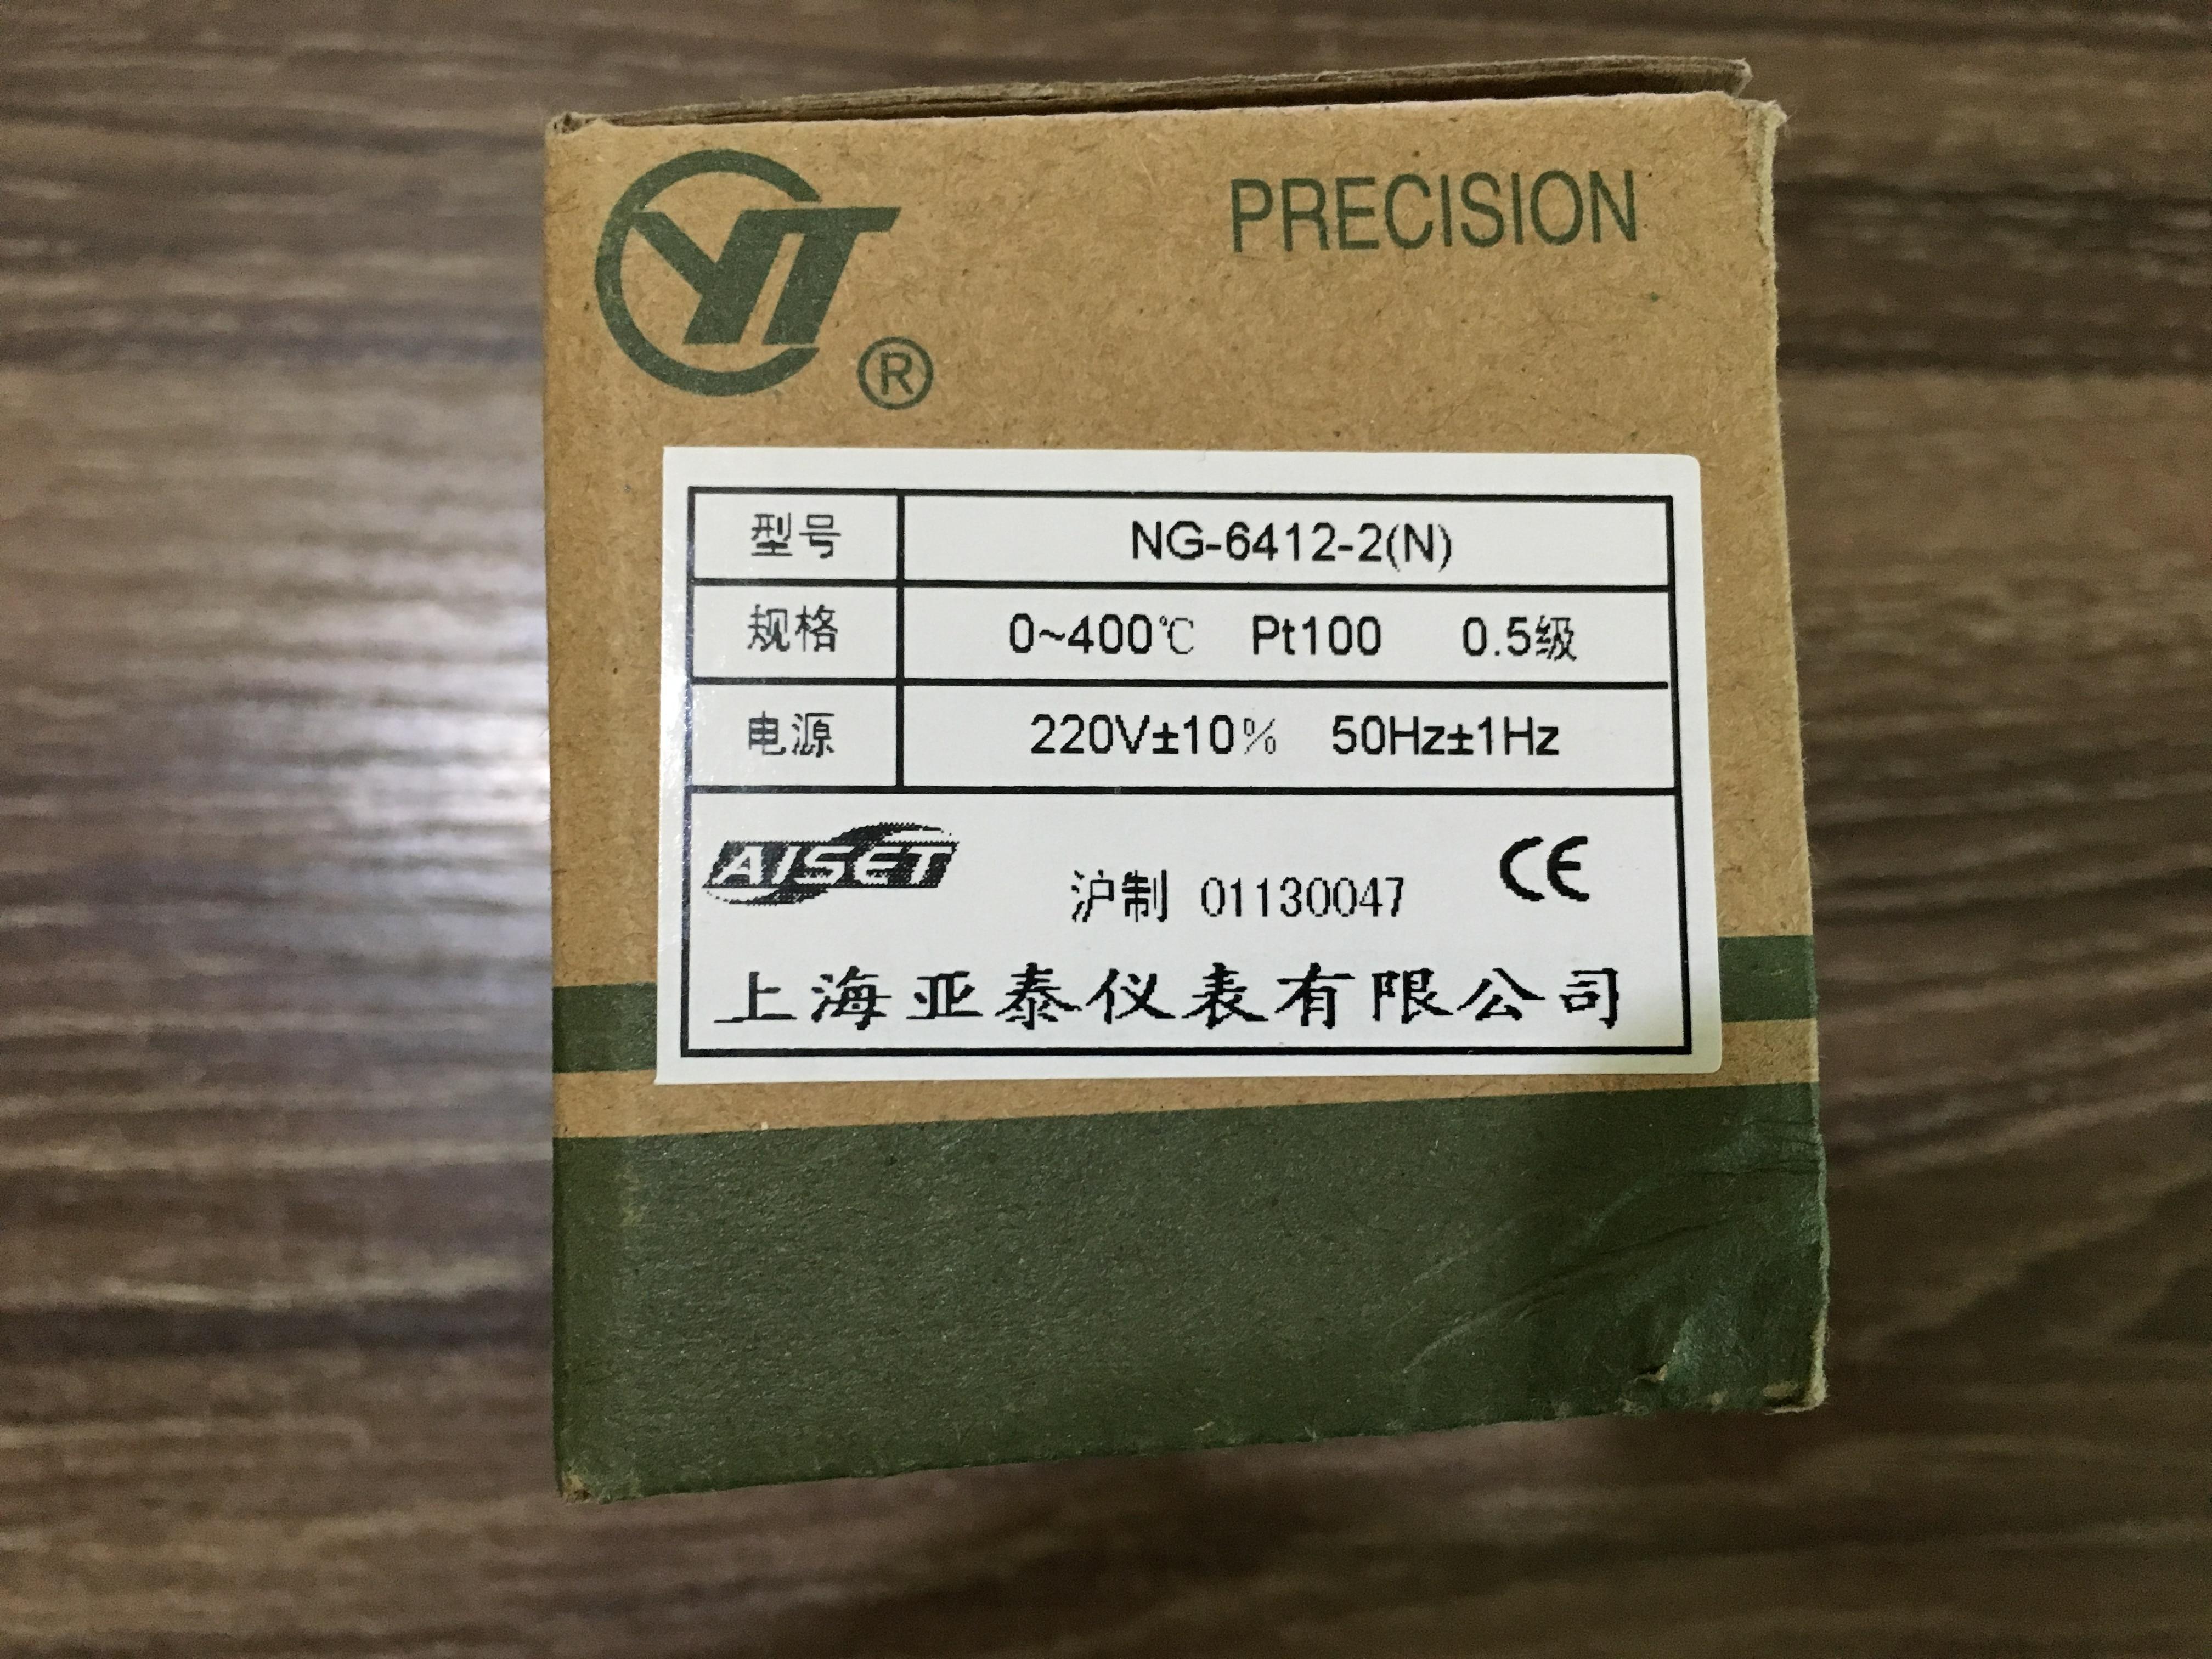 AISET controlador de temperatura genuino NG6000-2/NG-6412-2 nuevo termostato original PT100 0-400